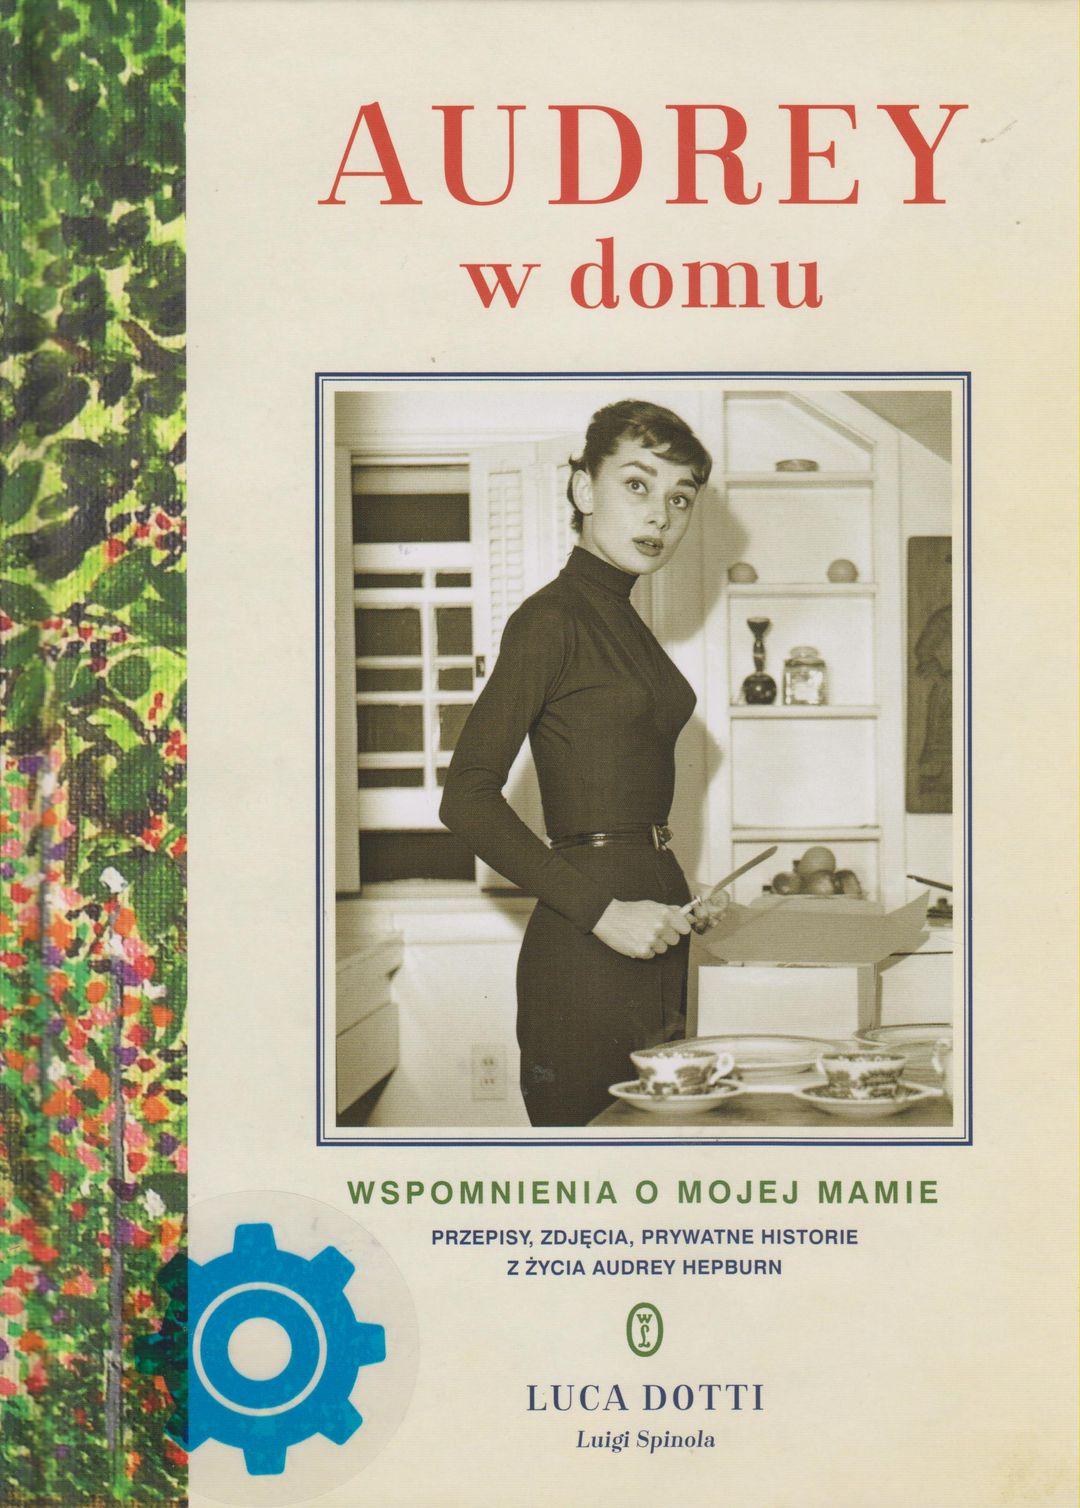 Dotti Luca – Audrey W Domu